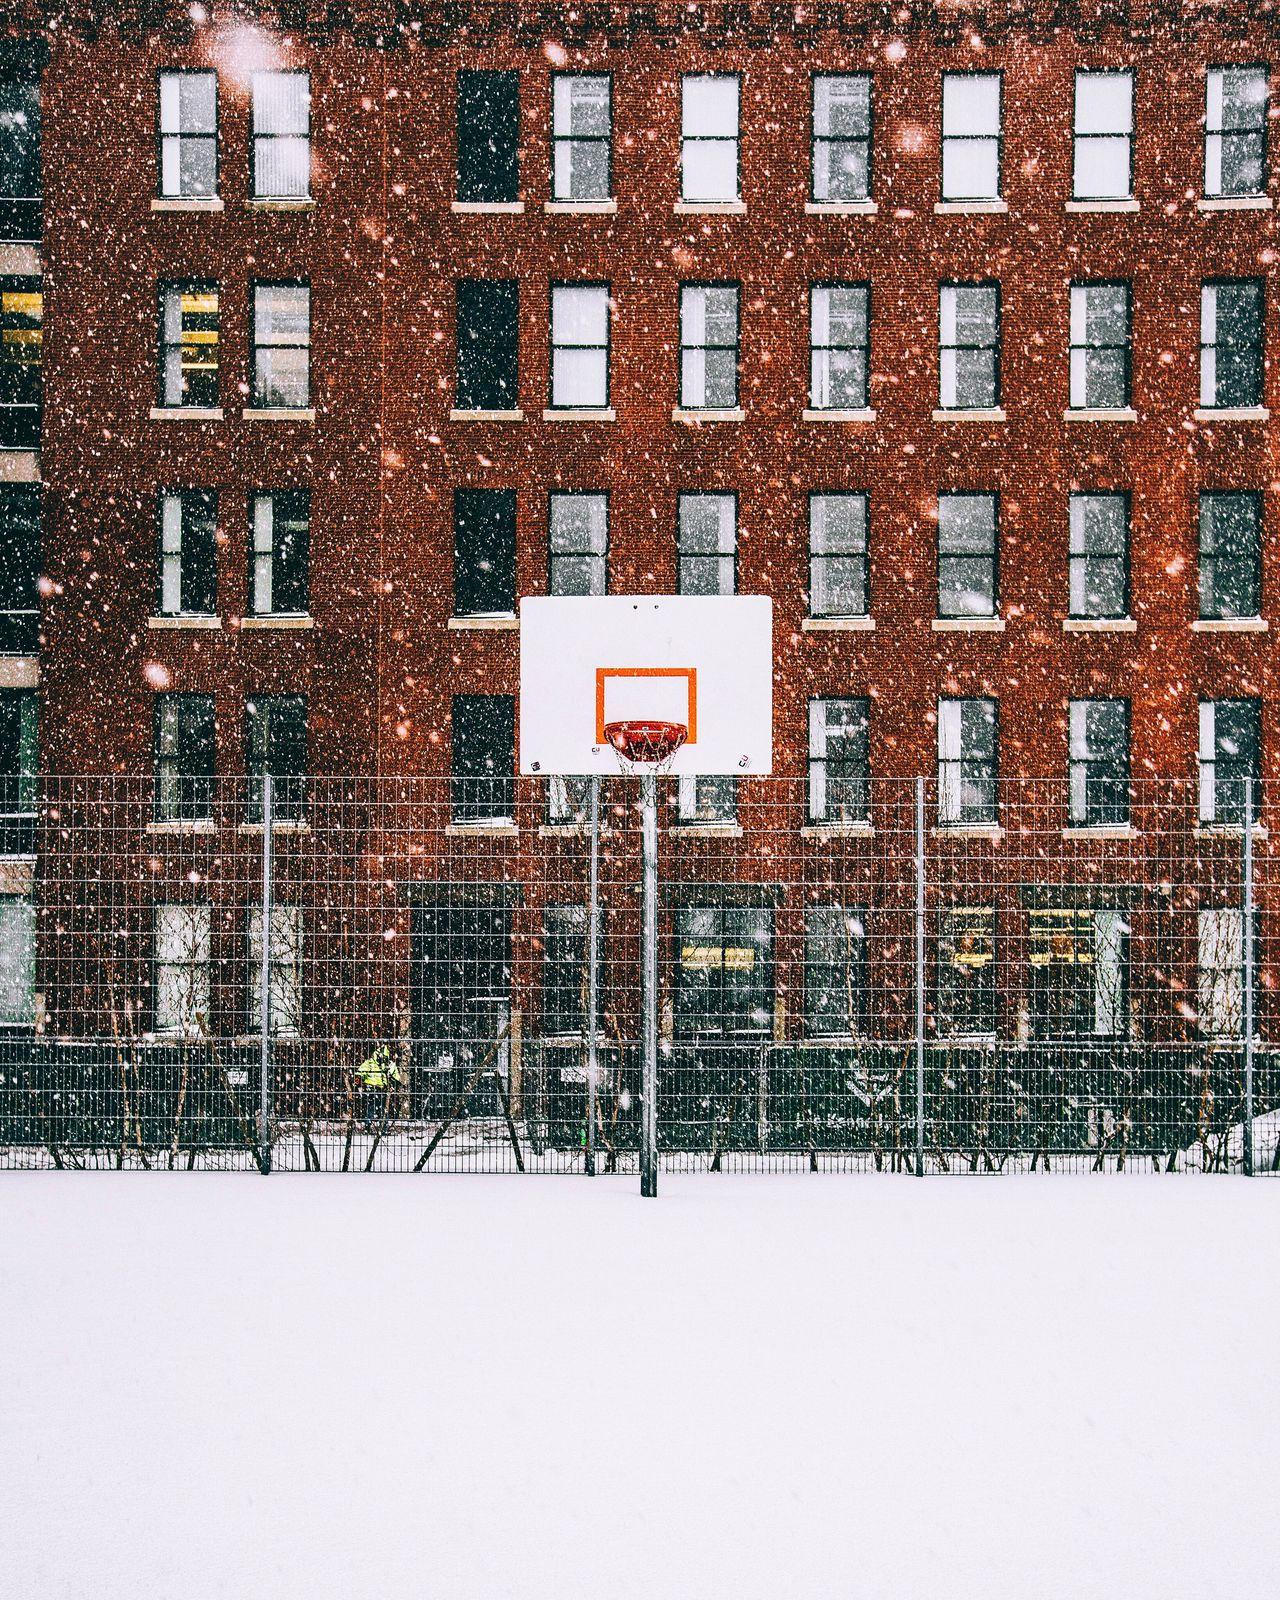 Basketball hoop in winter